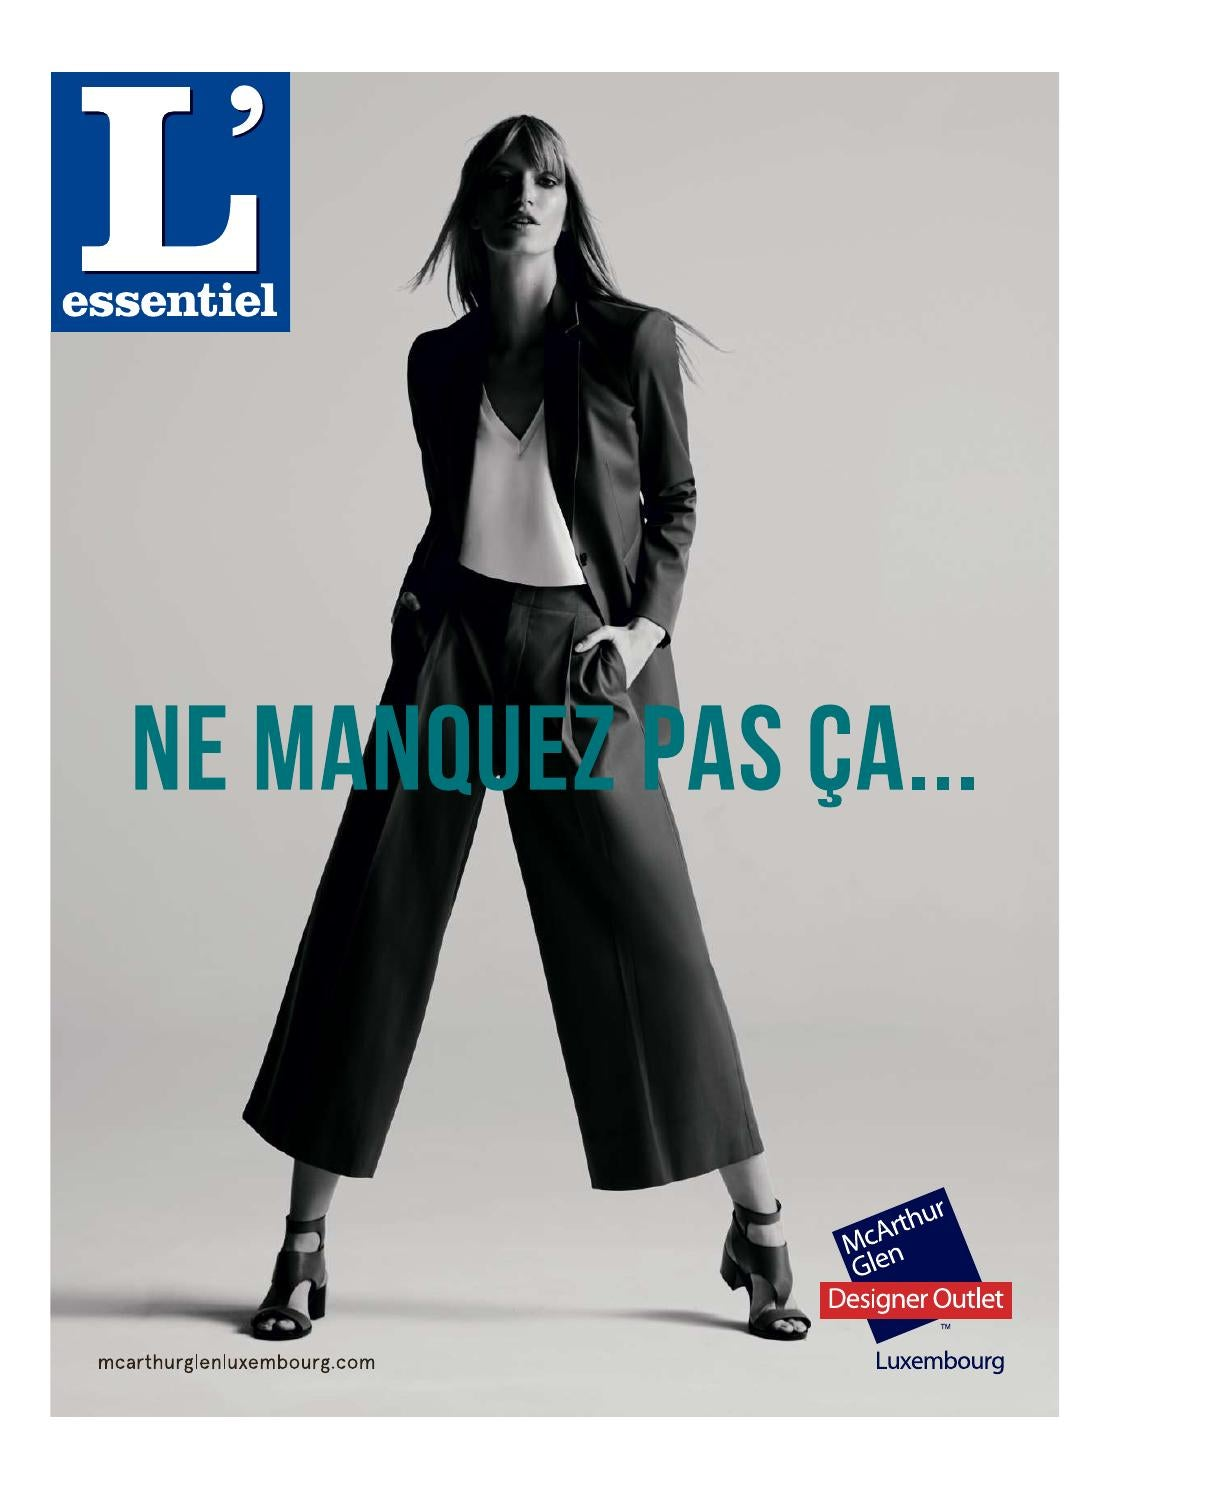 Pantalon homme Bugatti Fashion. La liberté s'appelle